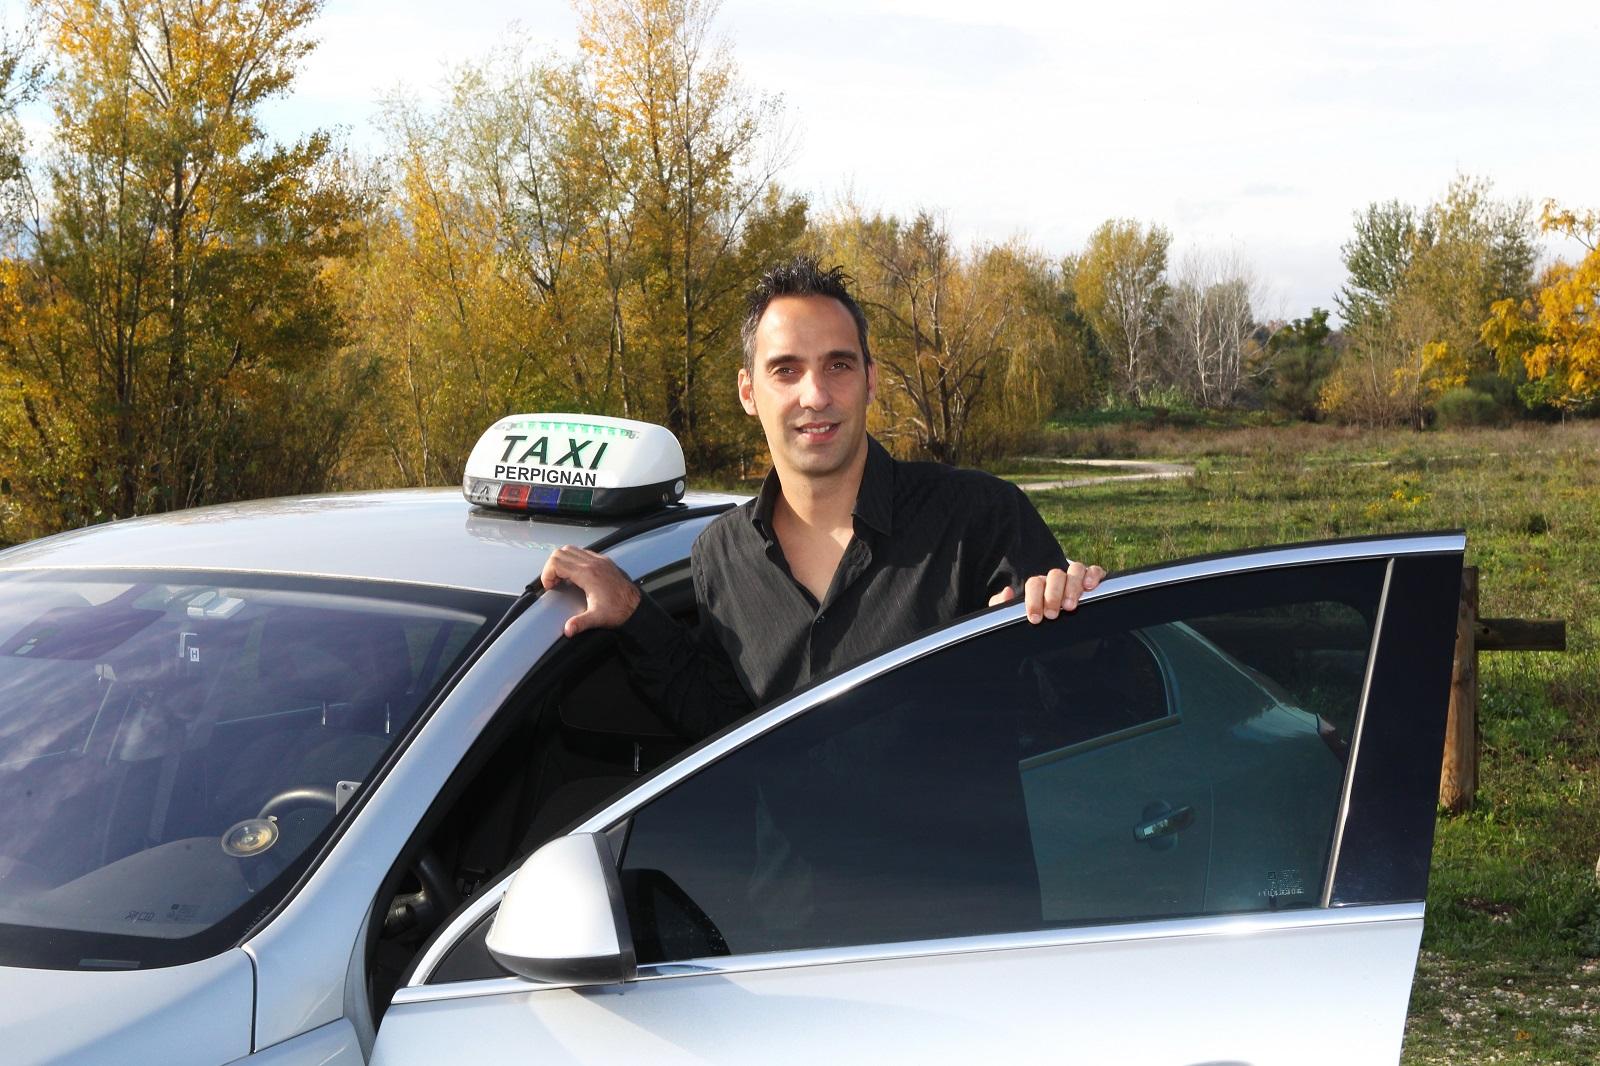 Alain-Roig-Taxi-Perpignan.jpg